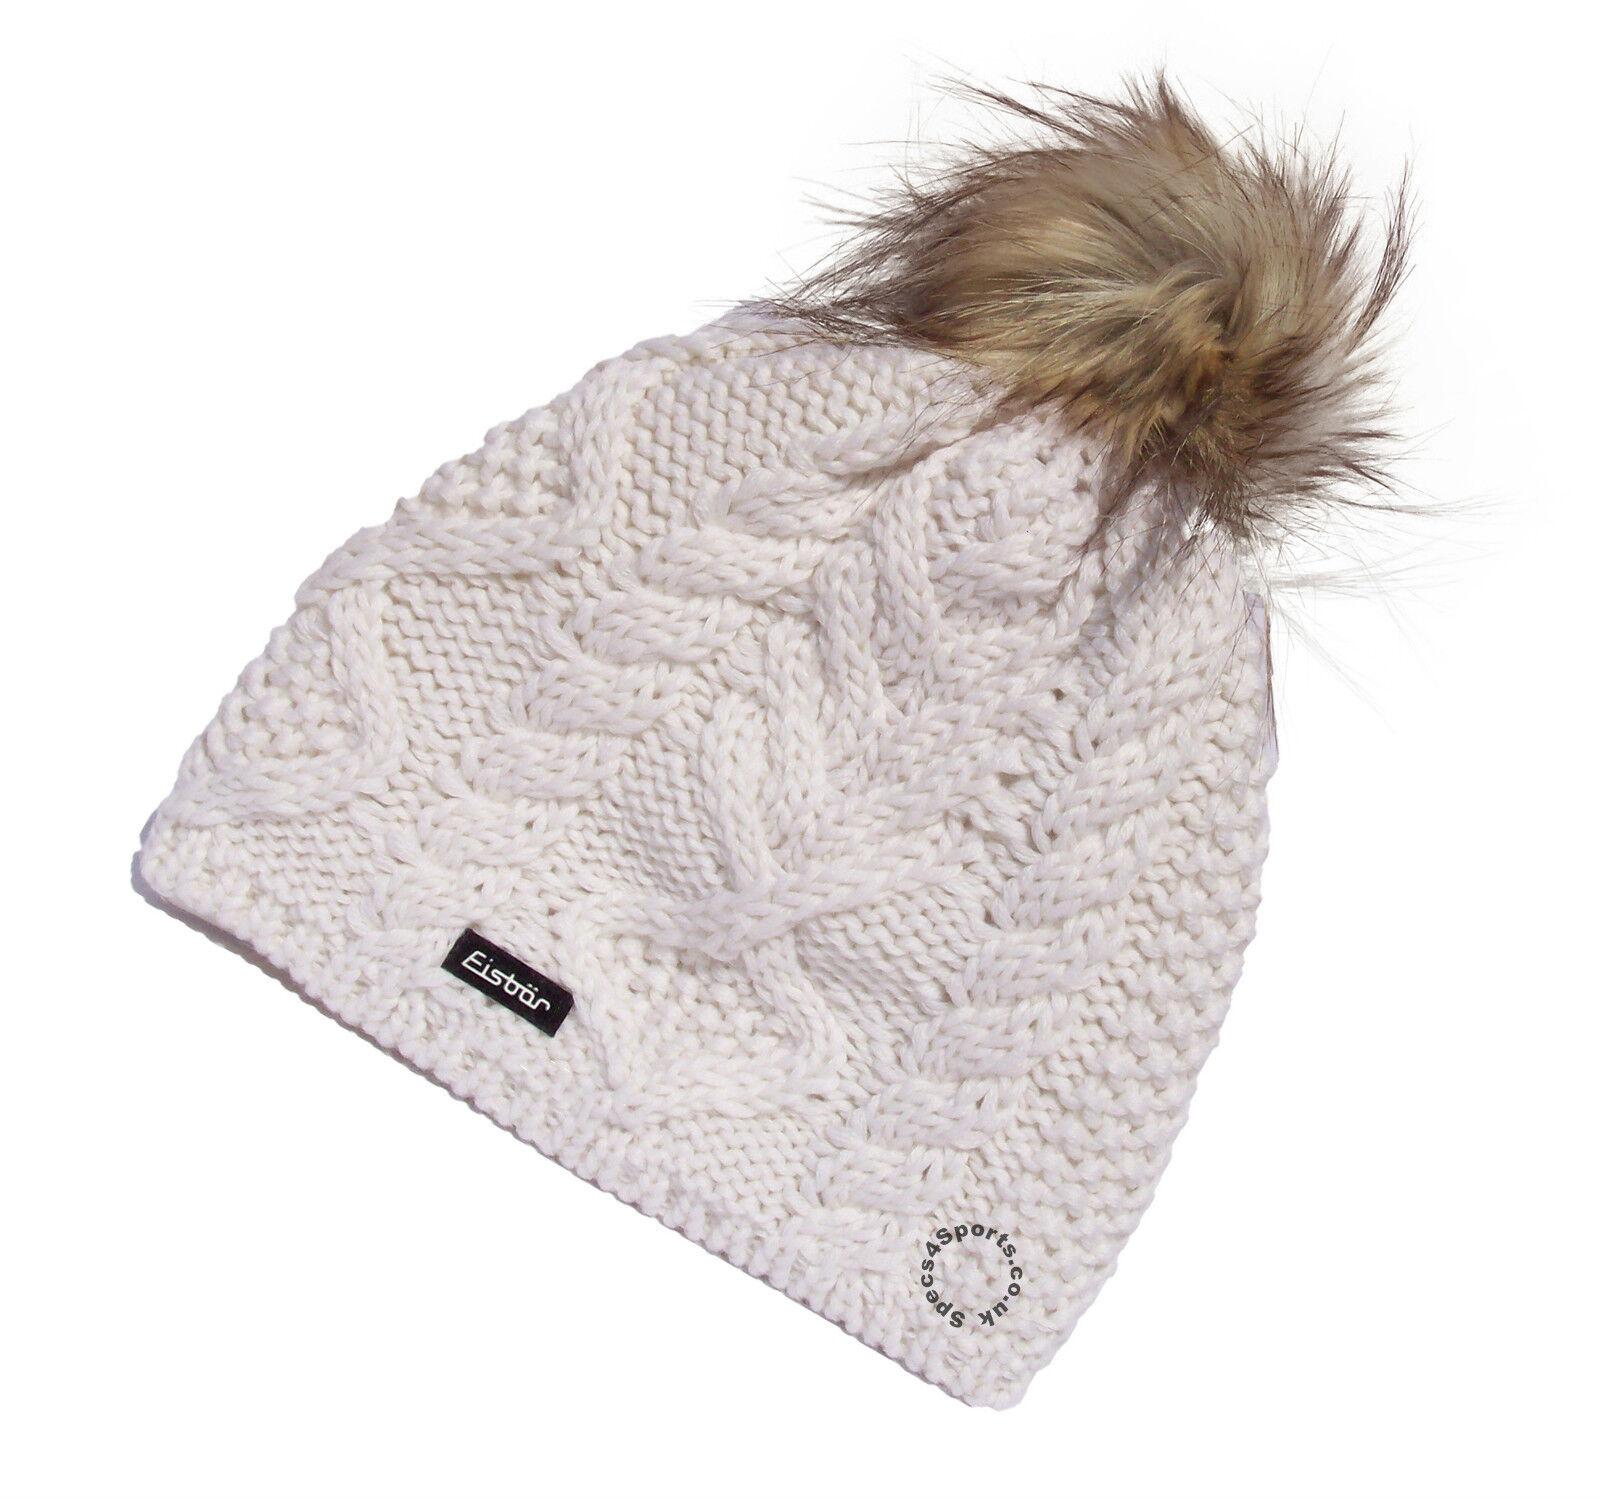 Eisbar Mirella LUX MU austriaca Invernali Finta Pelliccia SPORT POMPOM SPORT Pelliccia SCI cappello   GRATIS UK P+P 3f42ea